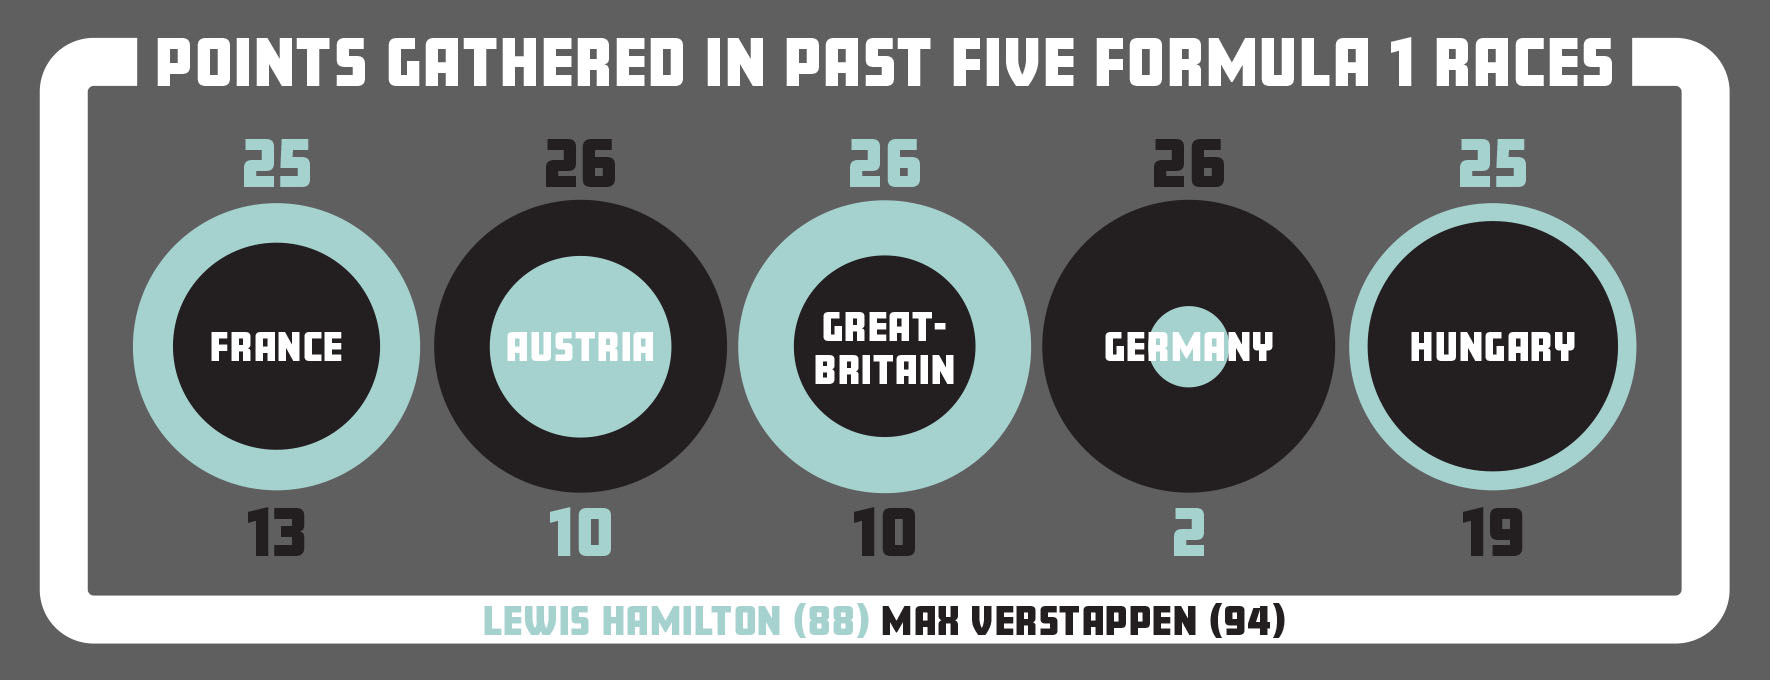 Formula 1 infographic